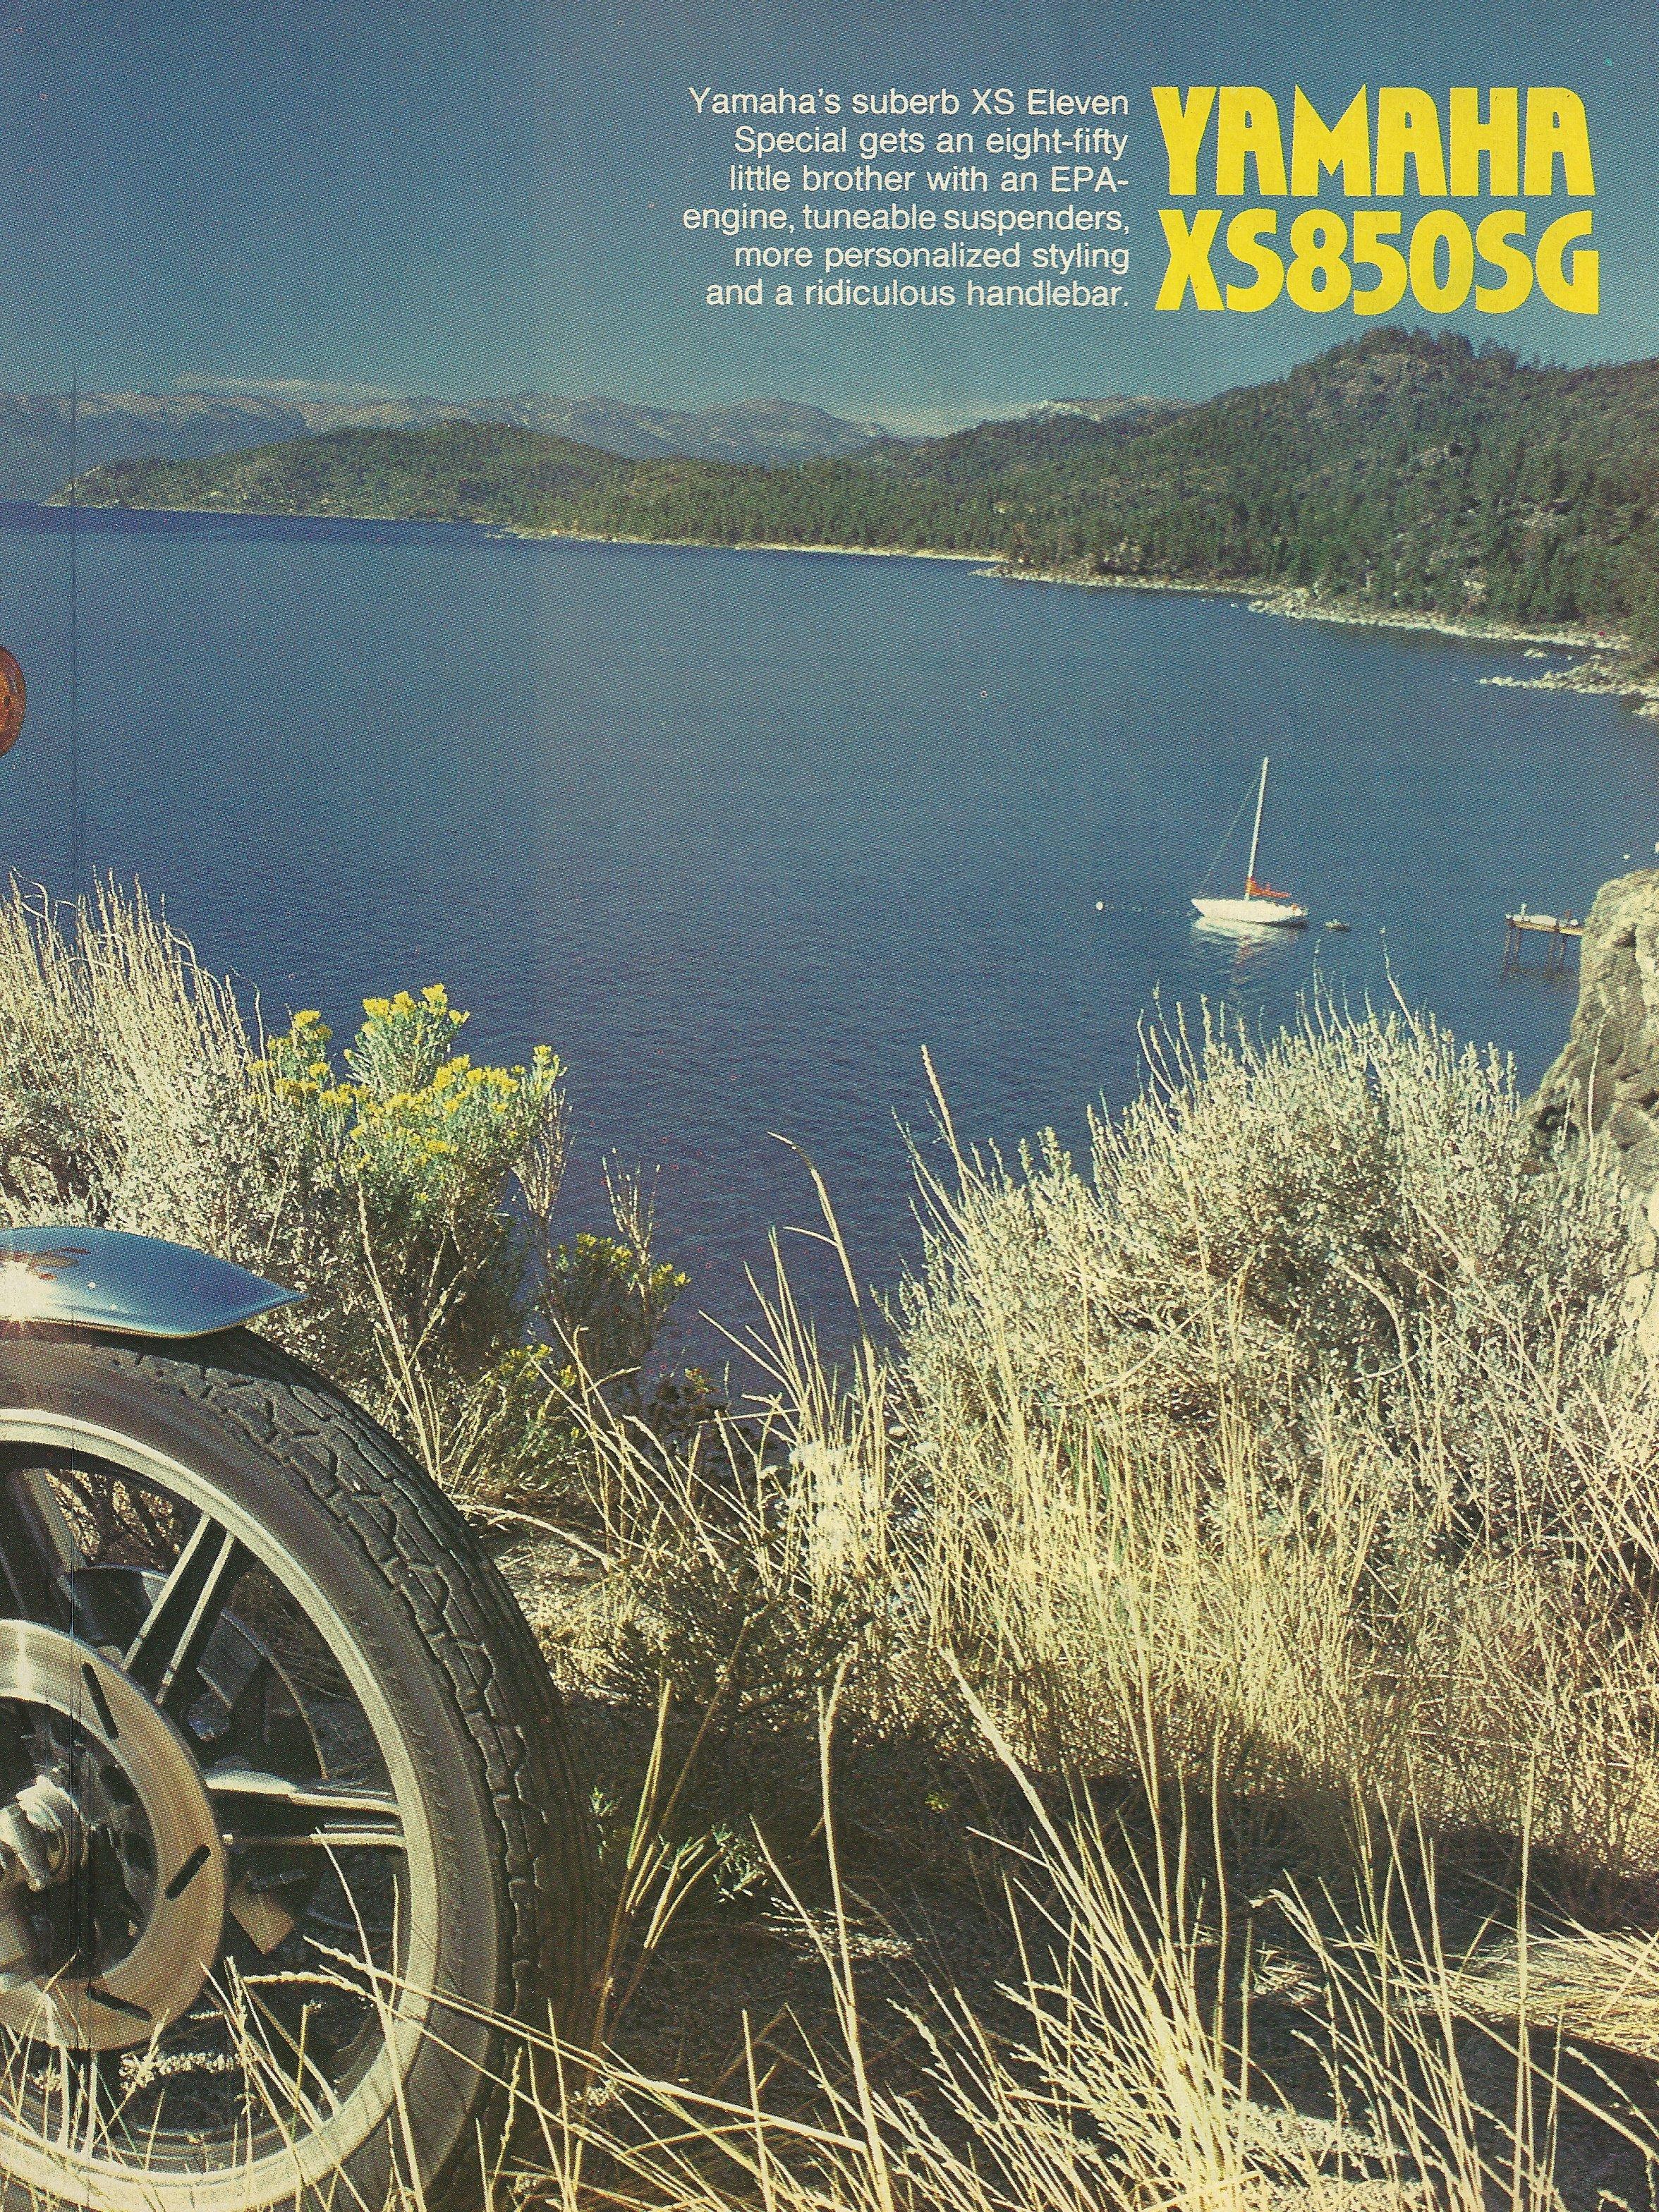 1980 Yamaha XS850SG road test 2.JPG